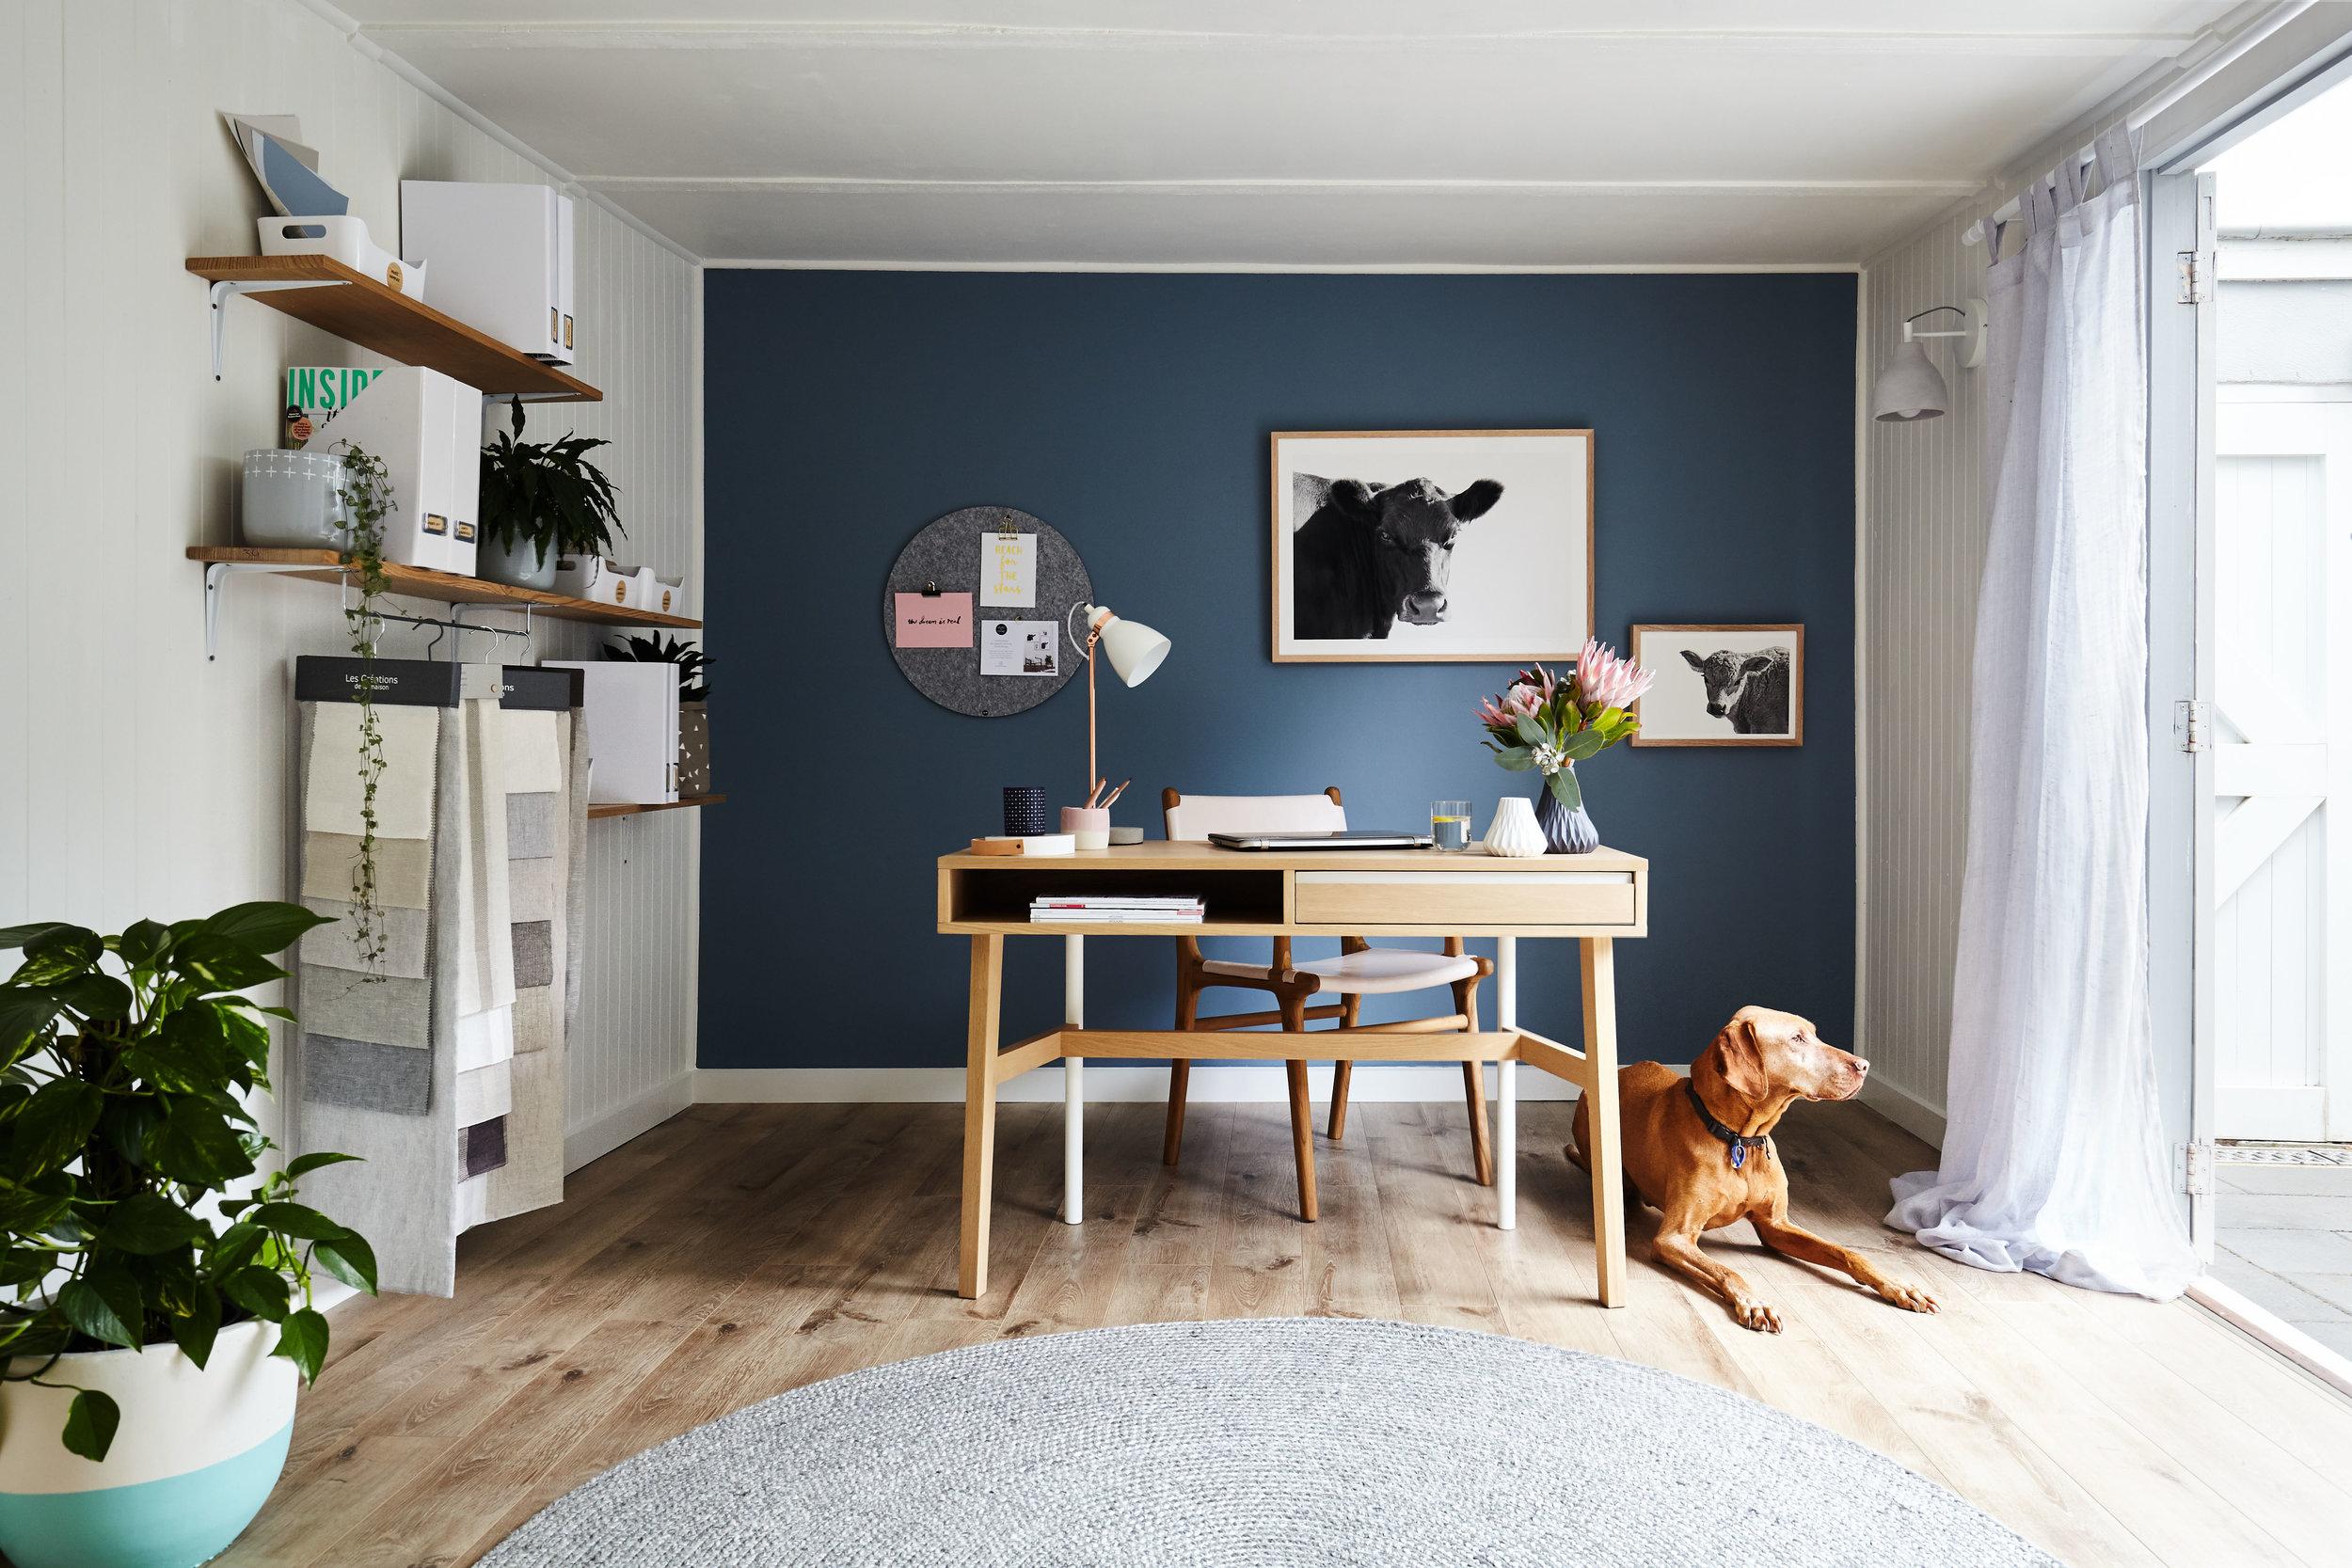 Maitland Street Interiors, Sarah Elshaug, Interior Decorator Melbourne, The MSI Studio, Studio Dog, Hungarian Vizsla